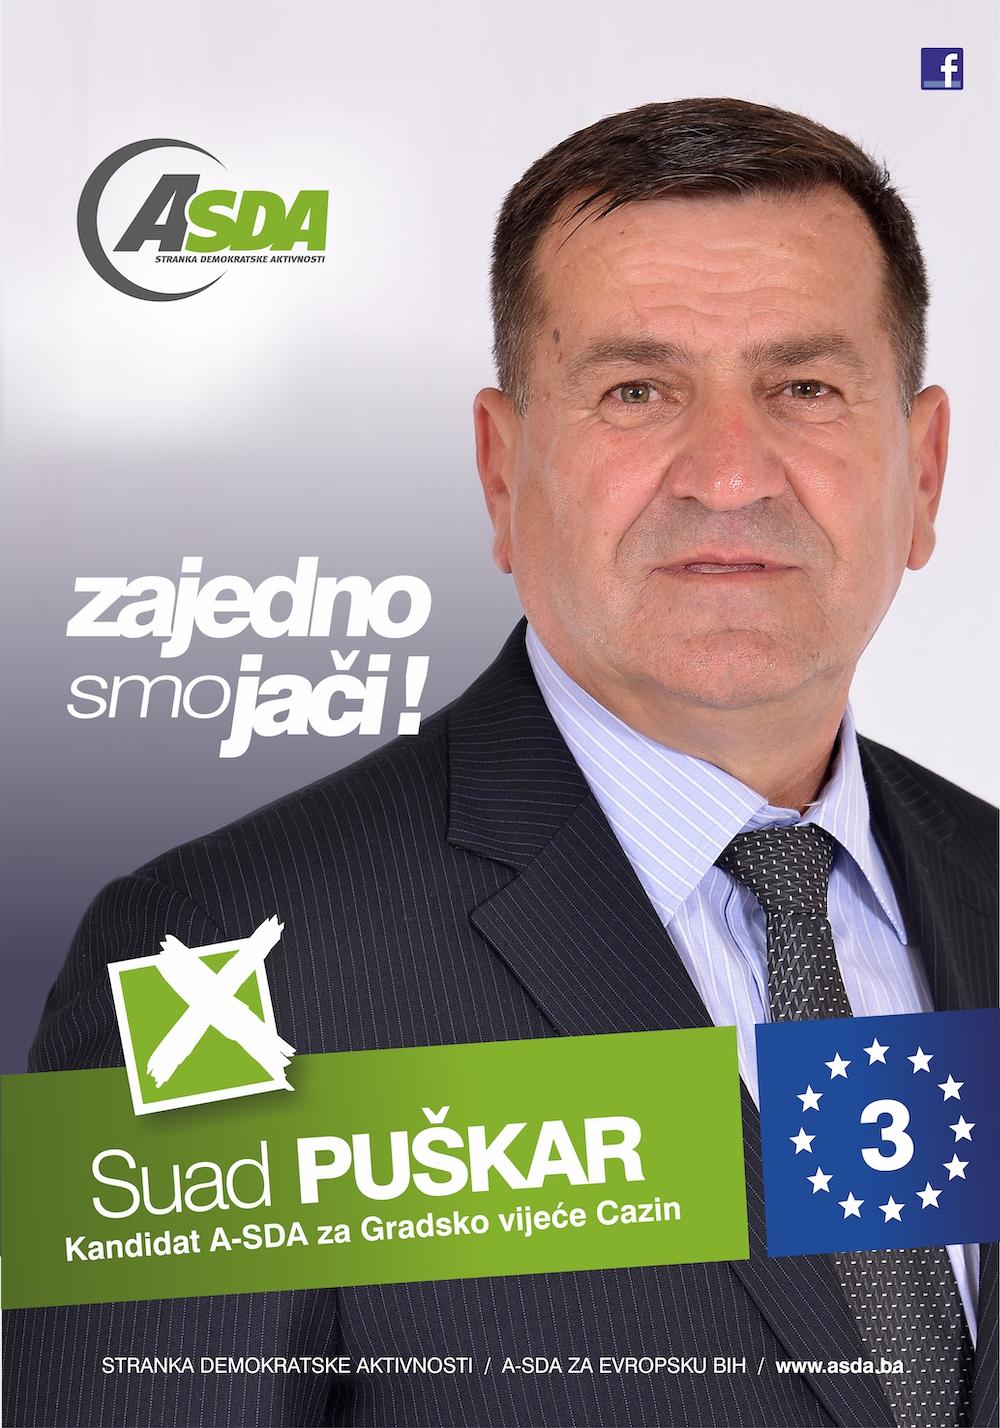 Sead Puškar